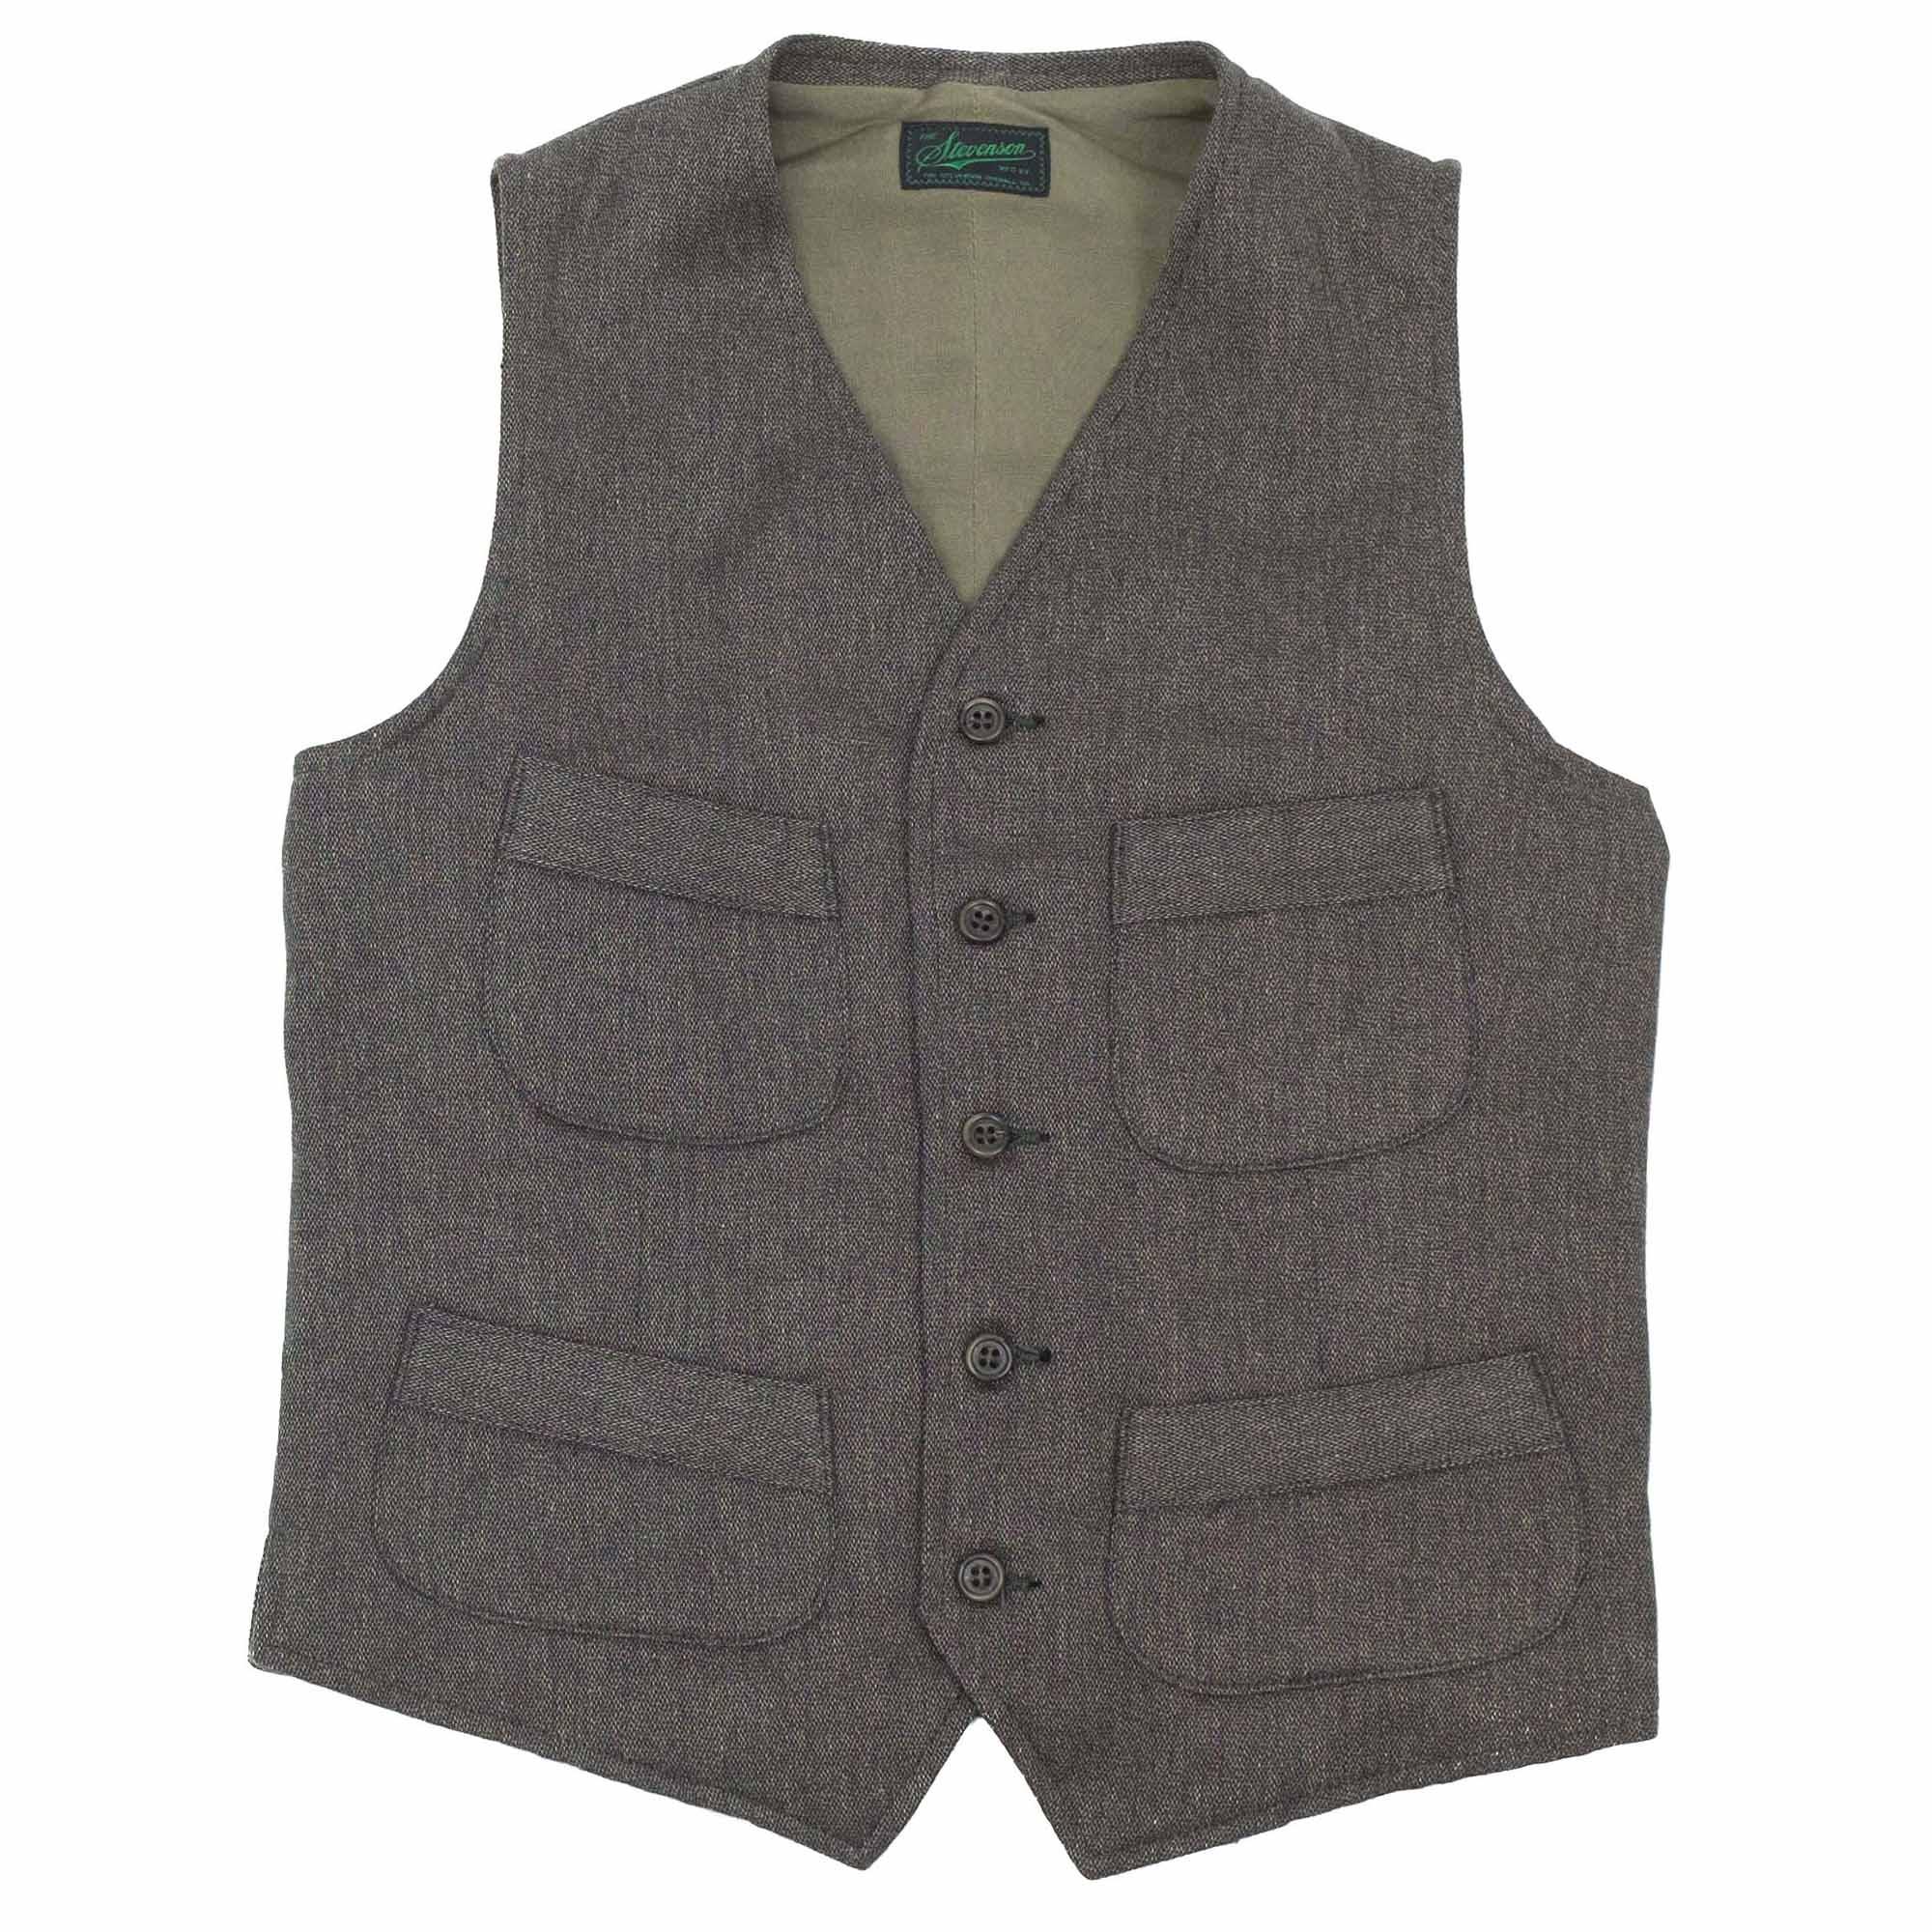 Stevenson Overall Co. Huntsman Vest - Charcoal Heather